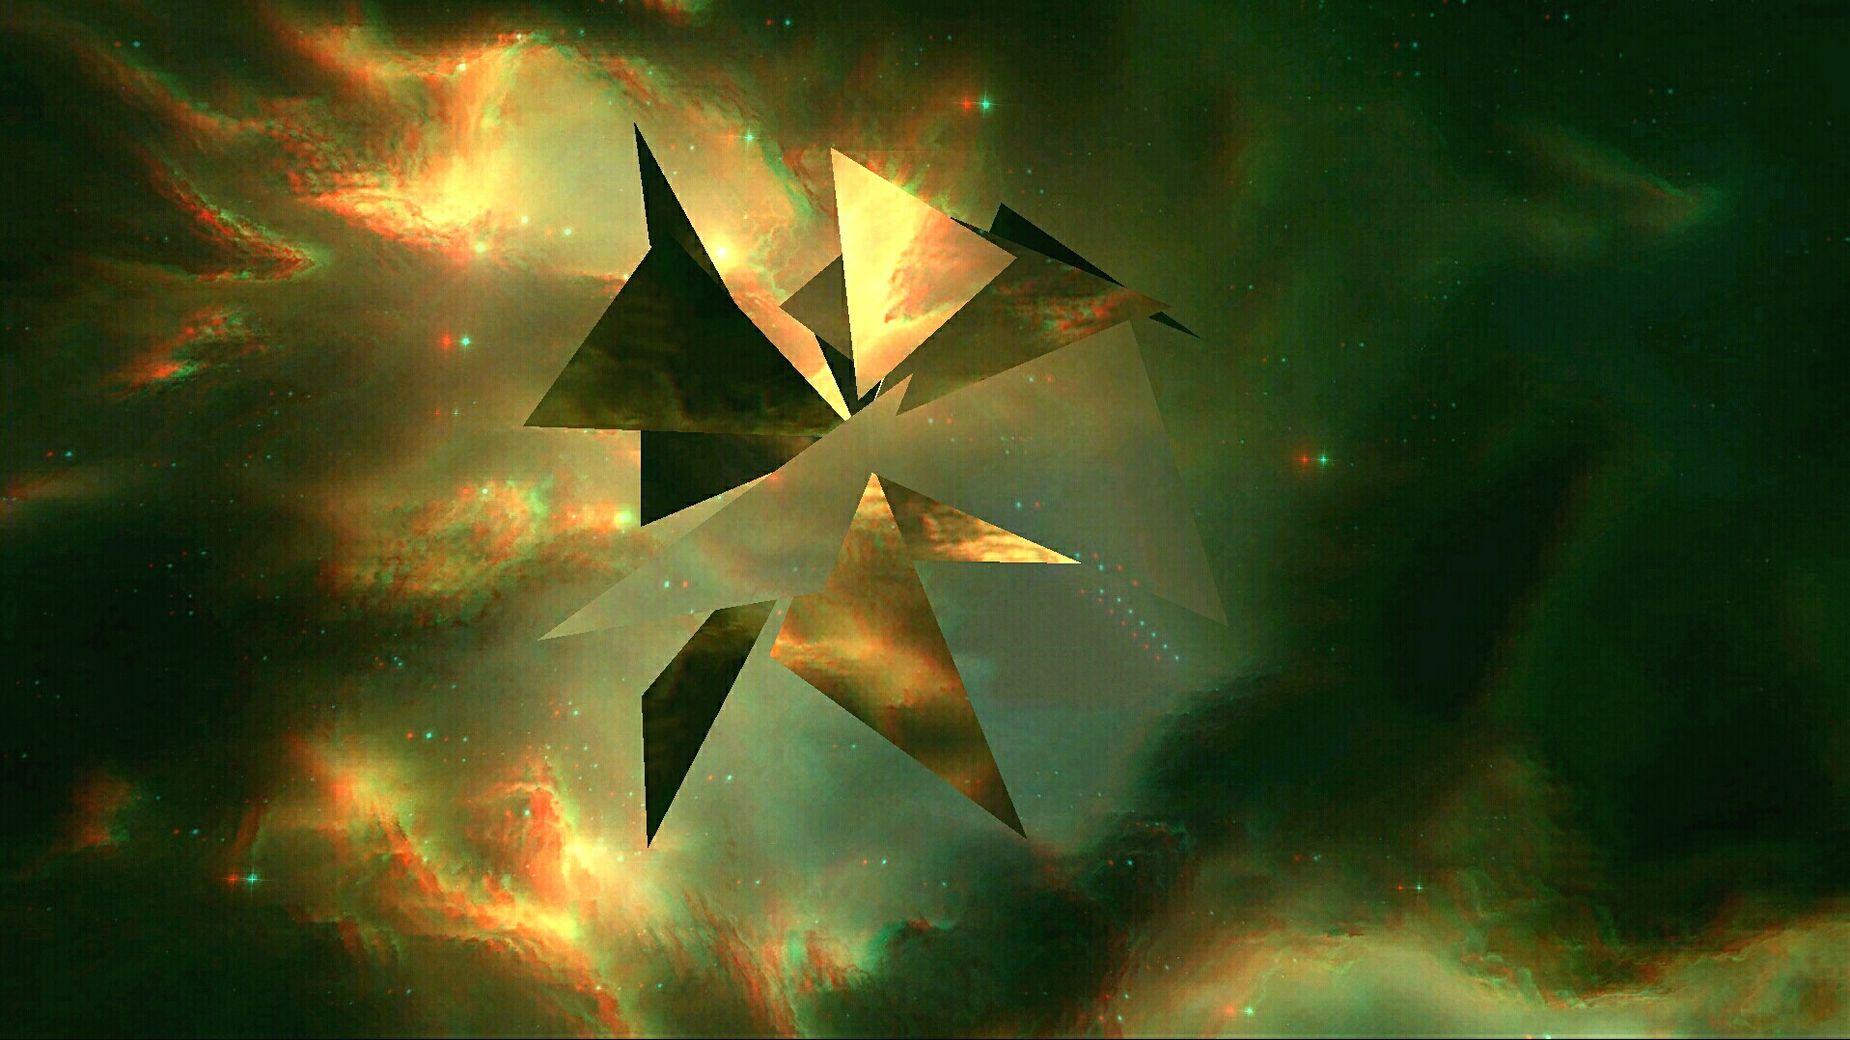 Die Unendlichkeit der Sphären . 2016 Art Light And Shadow Getting Inspired Space Stars Silence Fantasy Geometry Objects